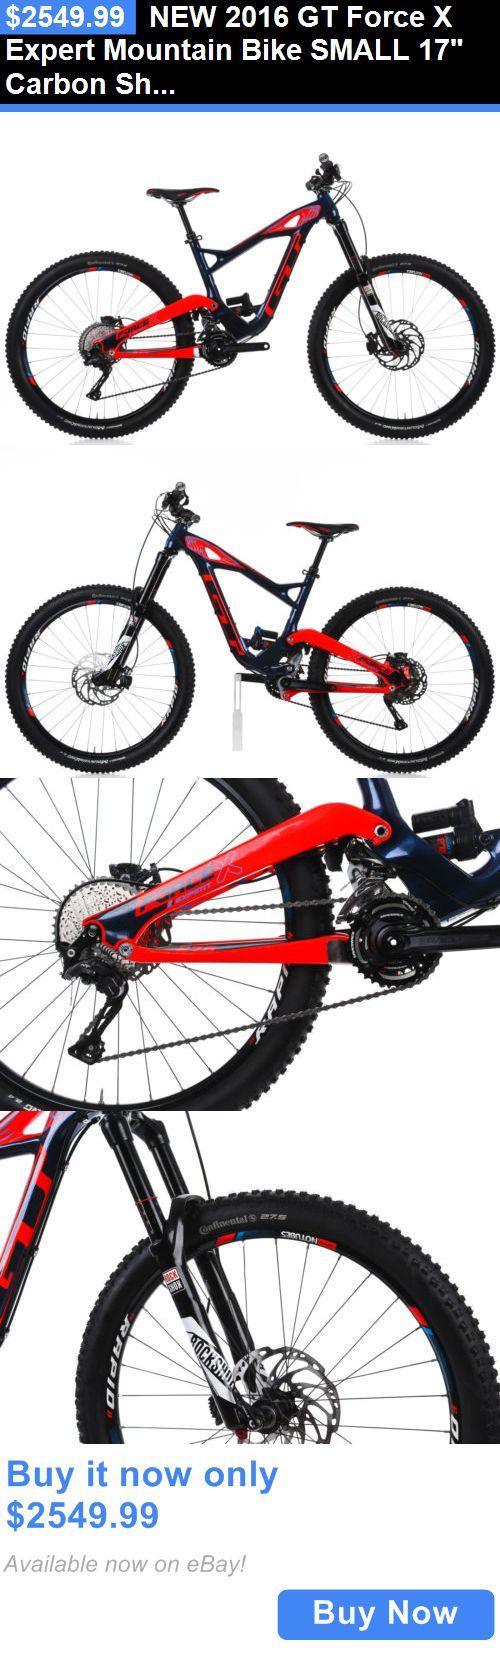 Sticker design for mountain bike - Bicycles New 2016 Gt Force X Expert Mountain Bike Small 17 Carbon Shimano Fox Rockshox